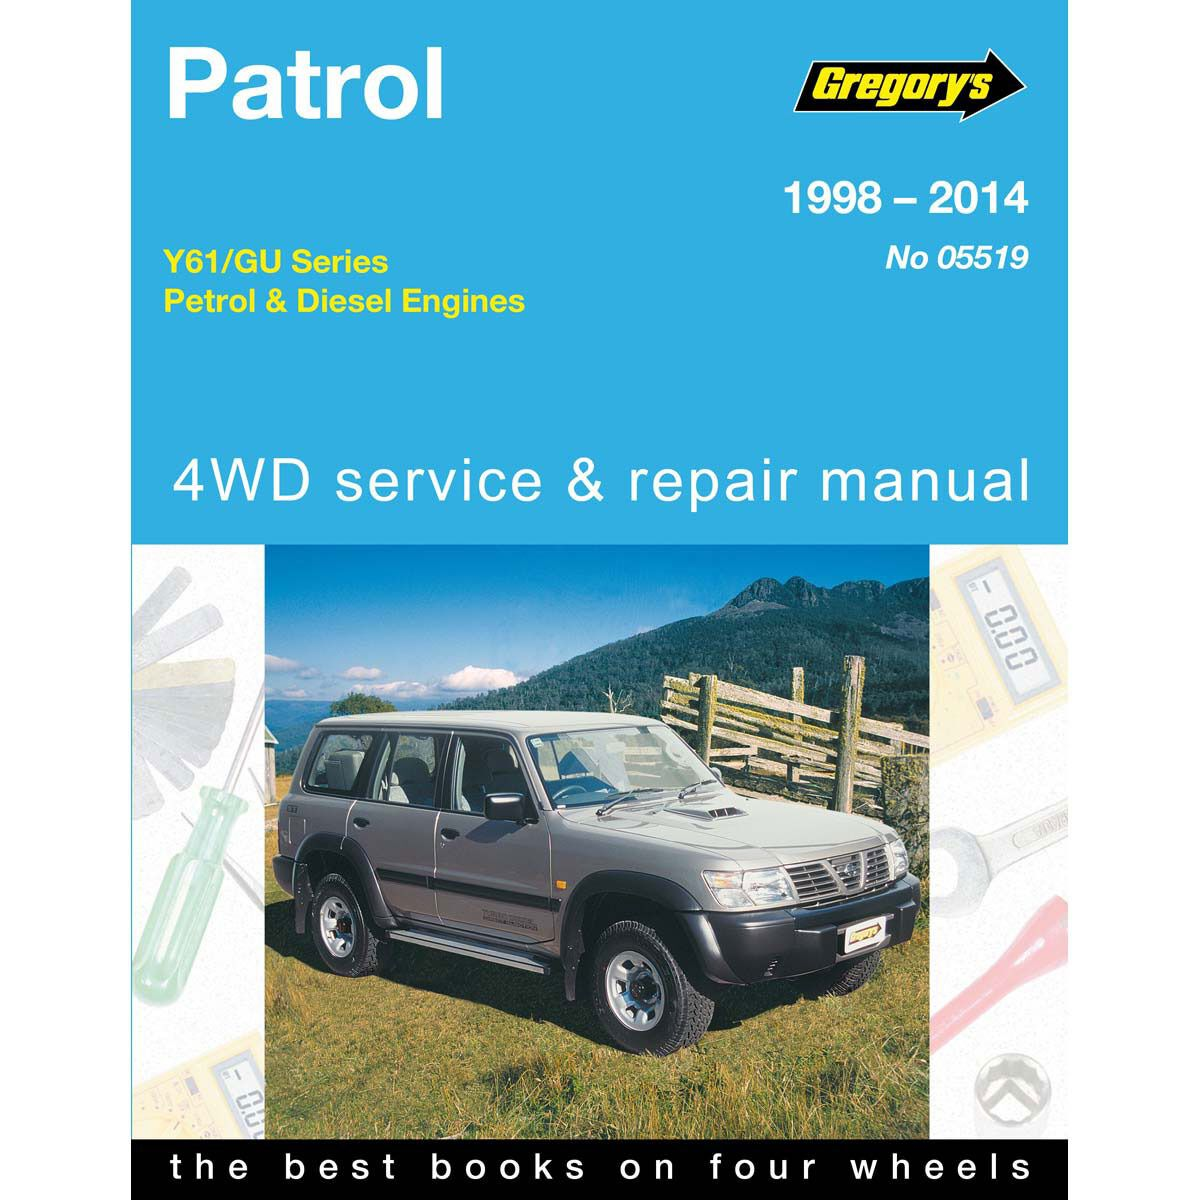 gregory s car manual for nissan patrol 1998 2014 519 supercheap auto rh supercheapauto com au  nissan urvan zd30 service manual